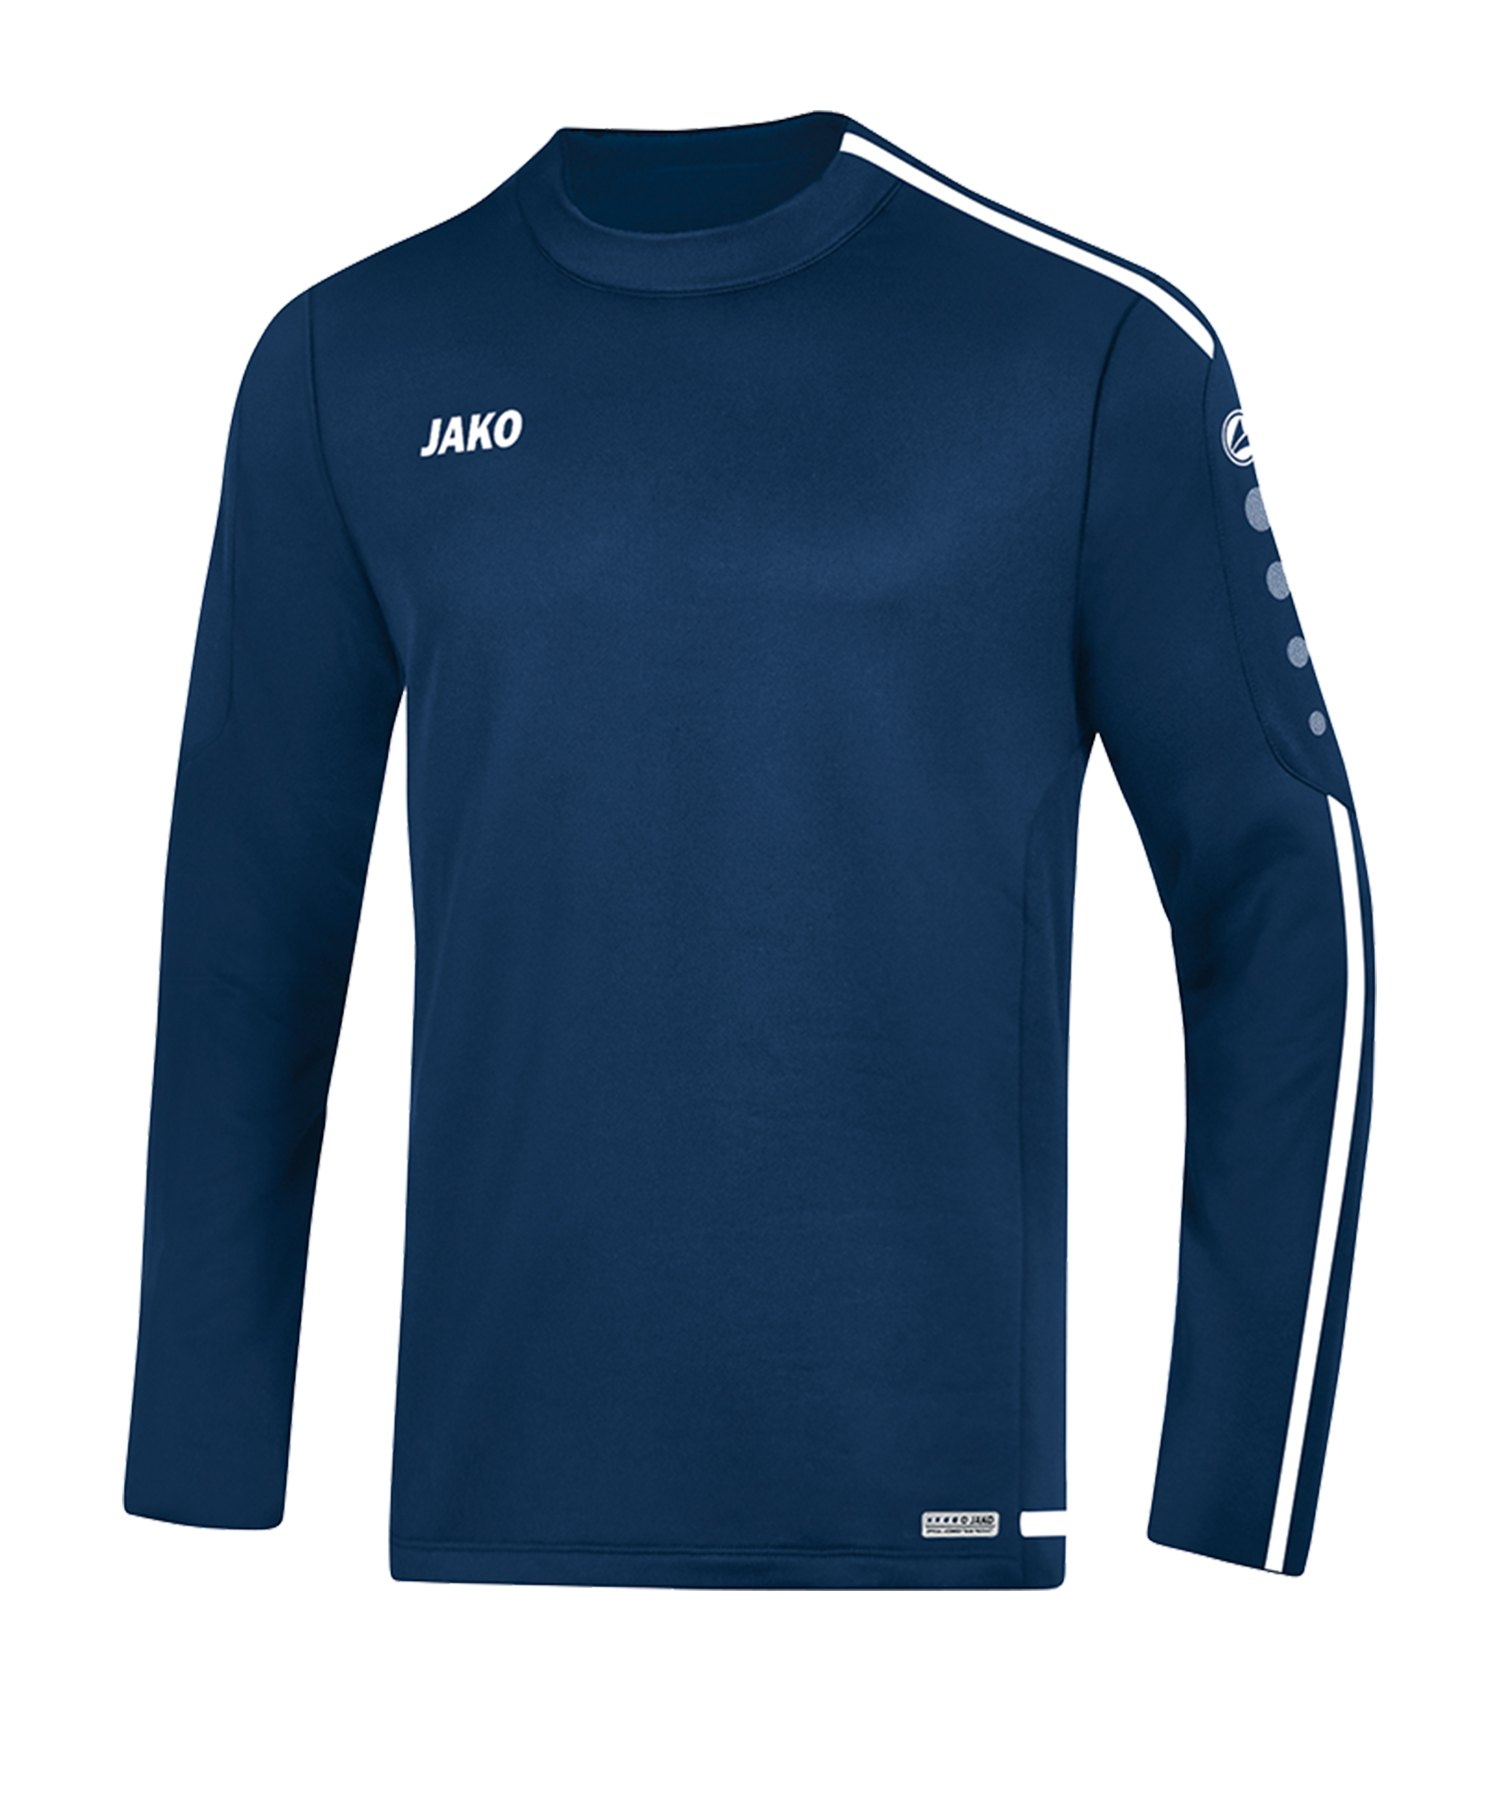 Jako Striker 2.0 Sweatshirt Kids Blau Weiss F04 - Blau